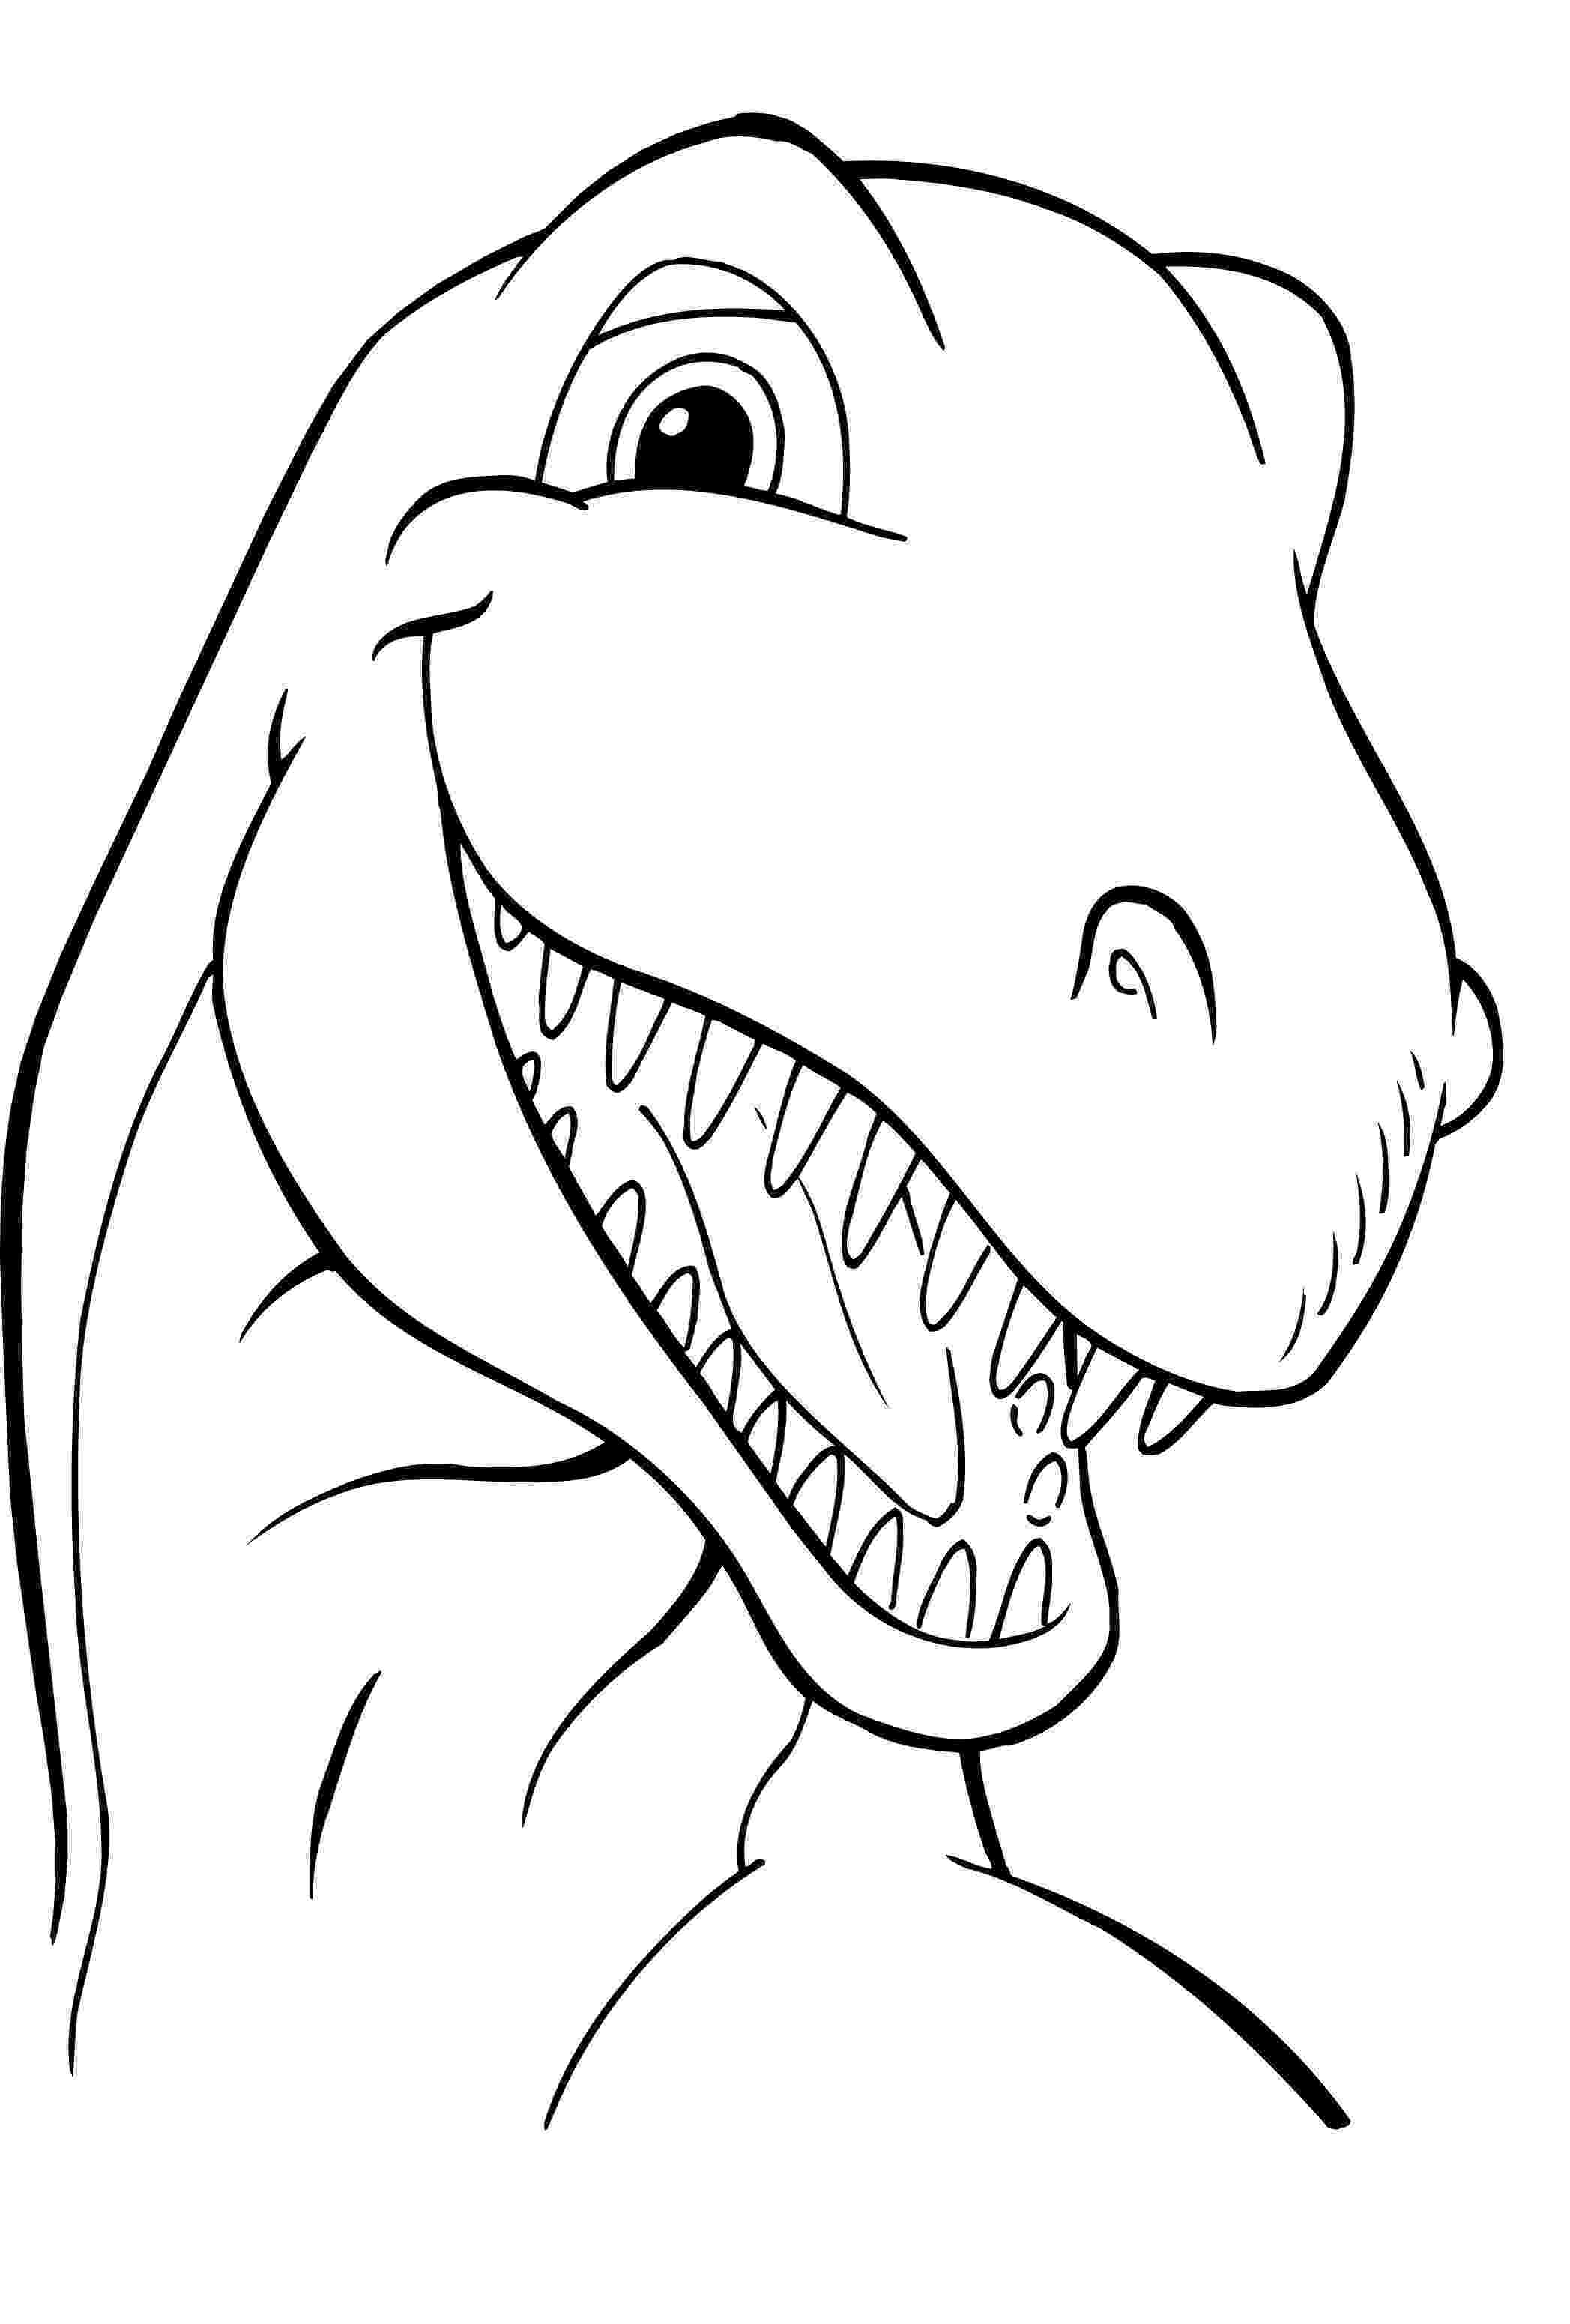 dinosuar coloring pages free printable dinosaur coloring pages for kids dinosuar pages coloring